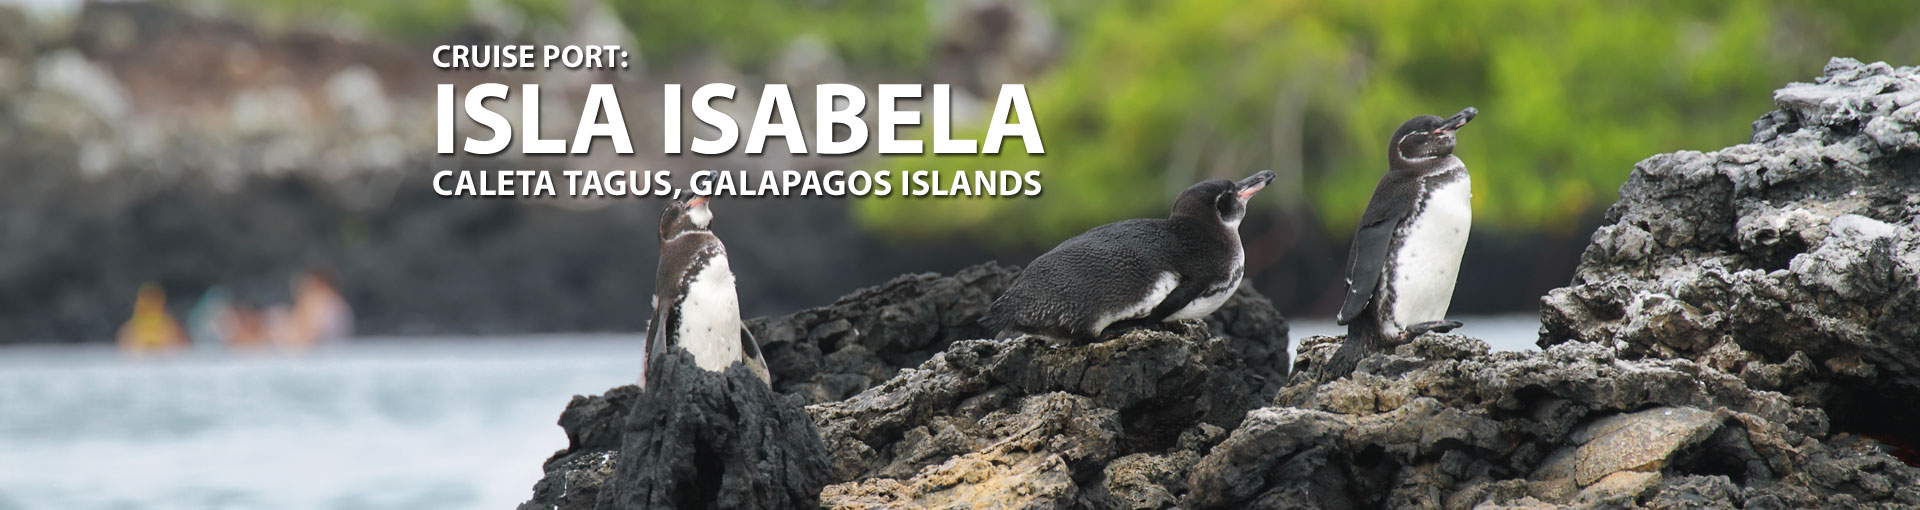 Cruises to Isla Isabela, Galapagos Islands